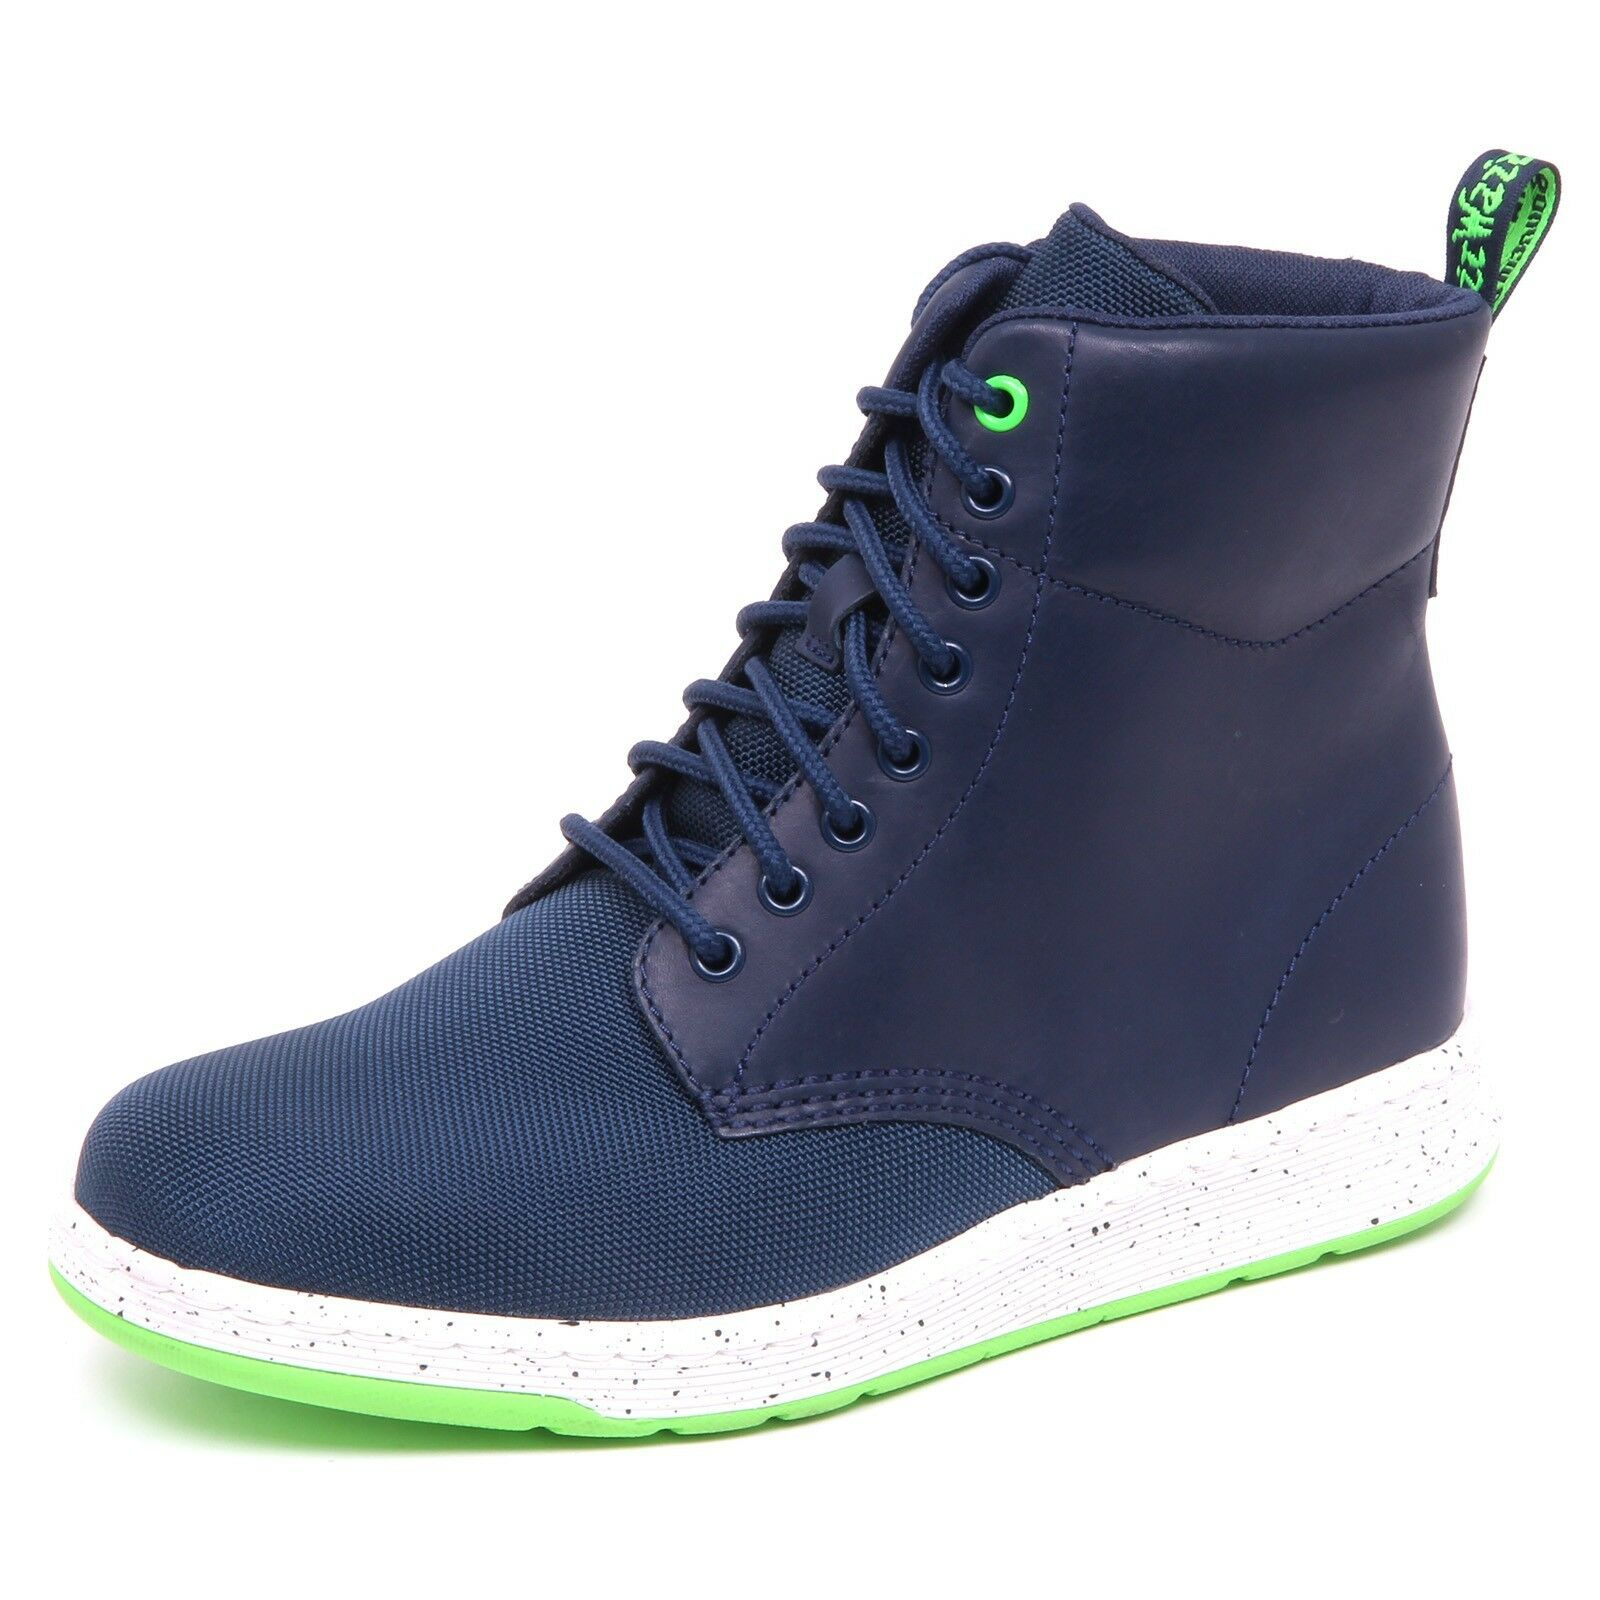 D8078 (without box) uomo sneaker uomo box) blu DR. MARTENS leather/tissue shoe man df3c23